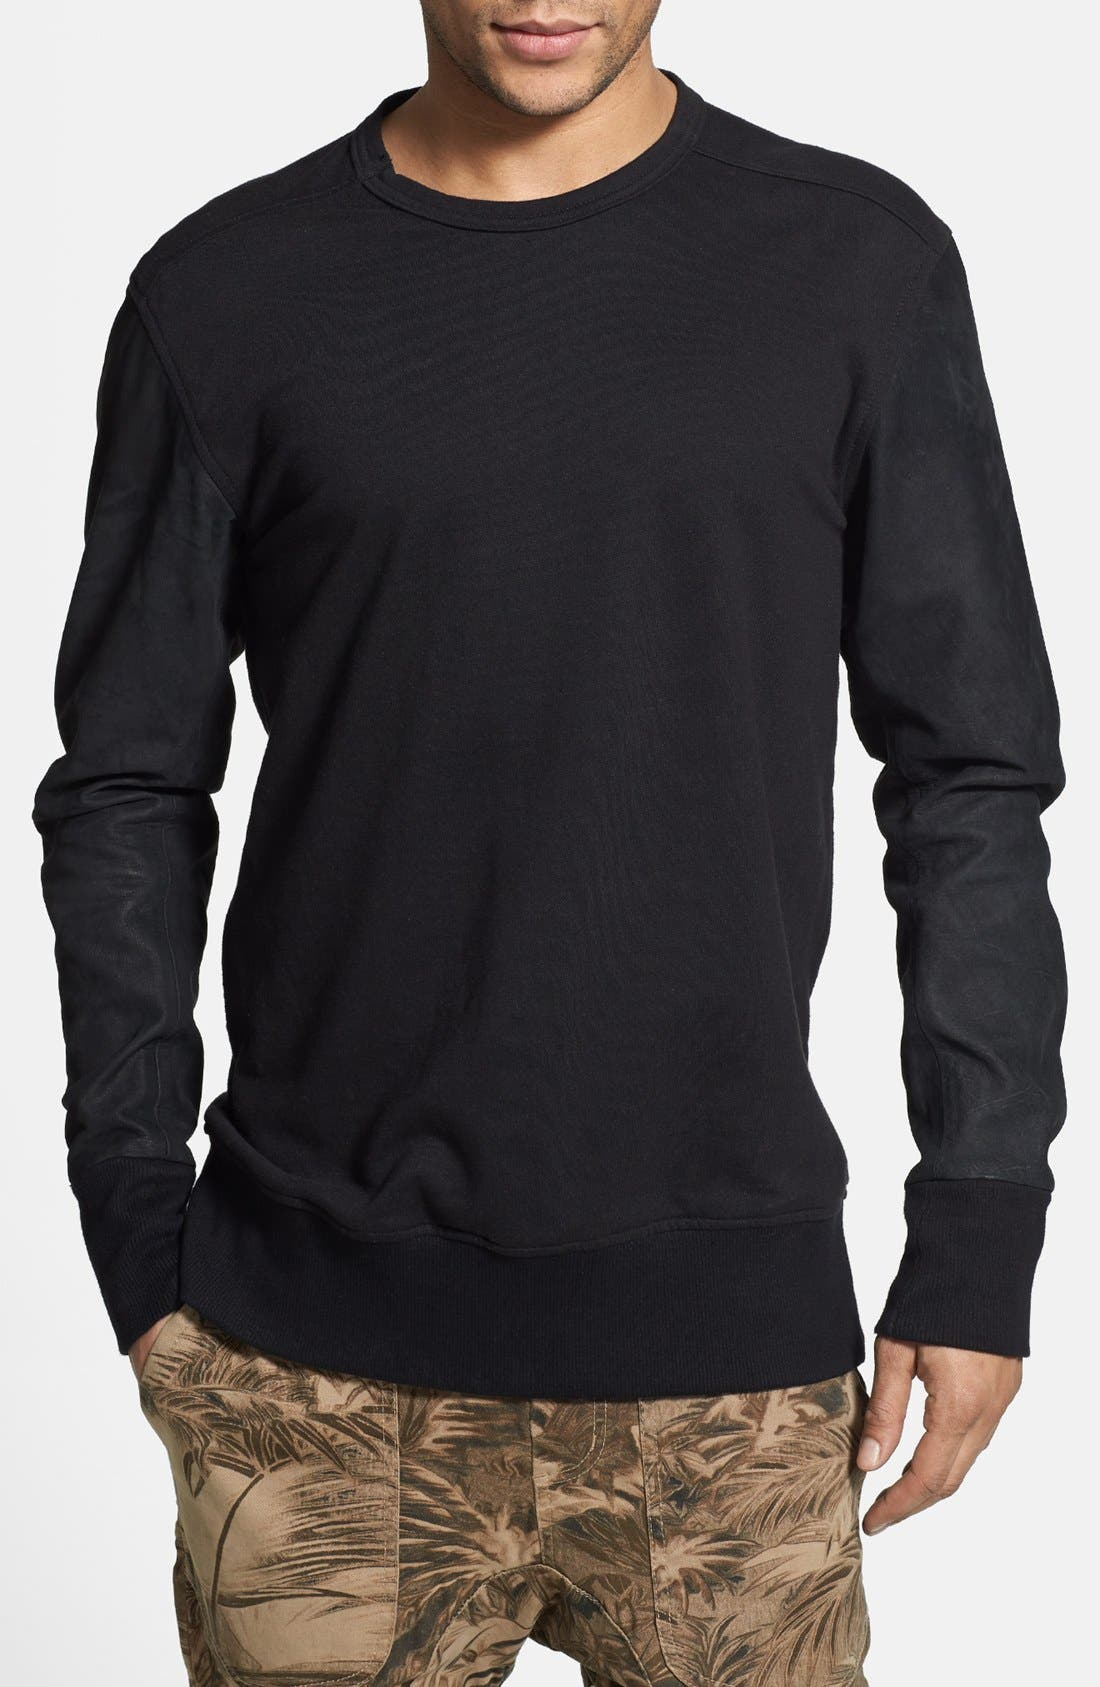 Alternate Image 1 Selected - ZANEROBE 'Primal' Crewneck Sweatshirt with Suede Sleeves